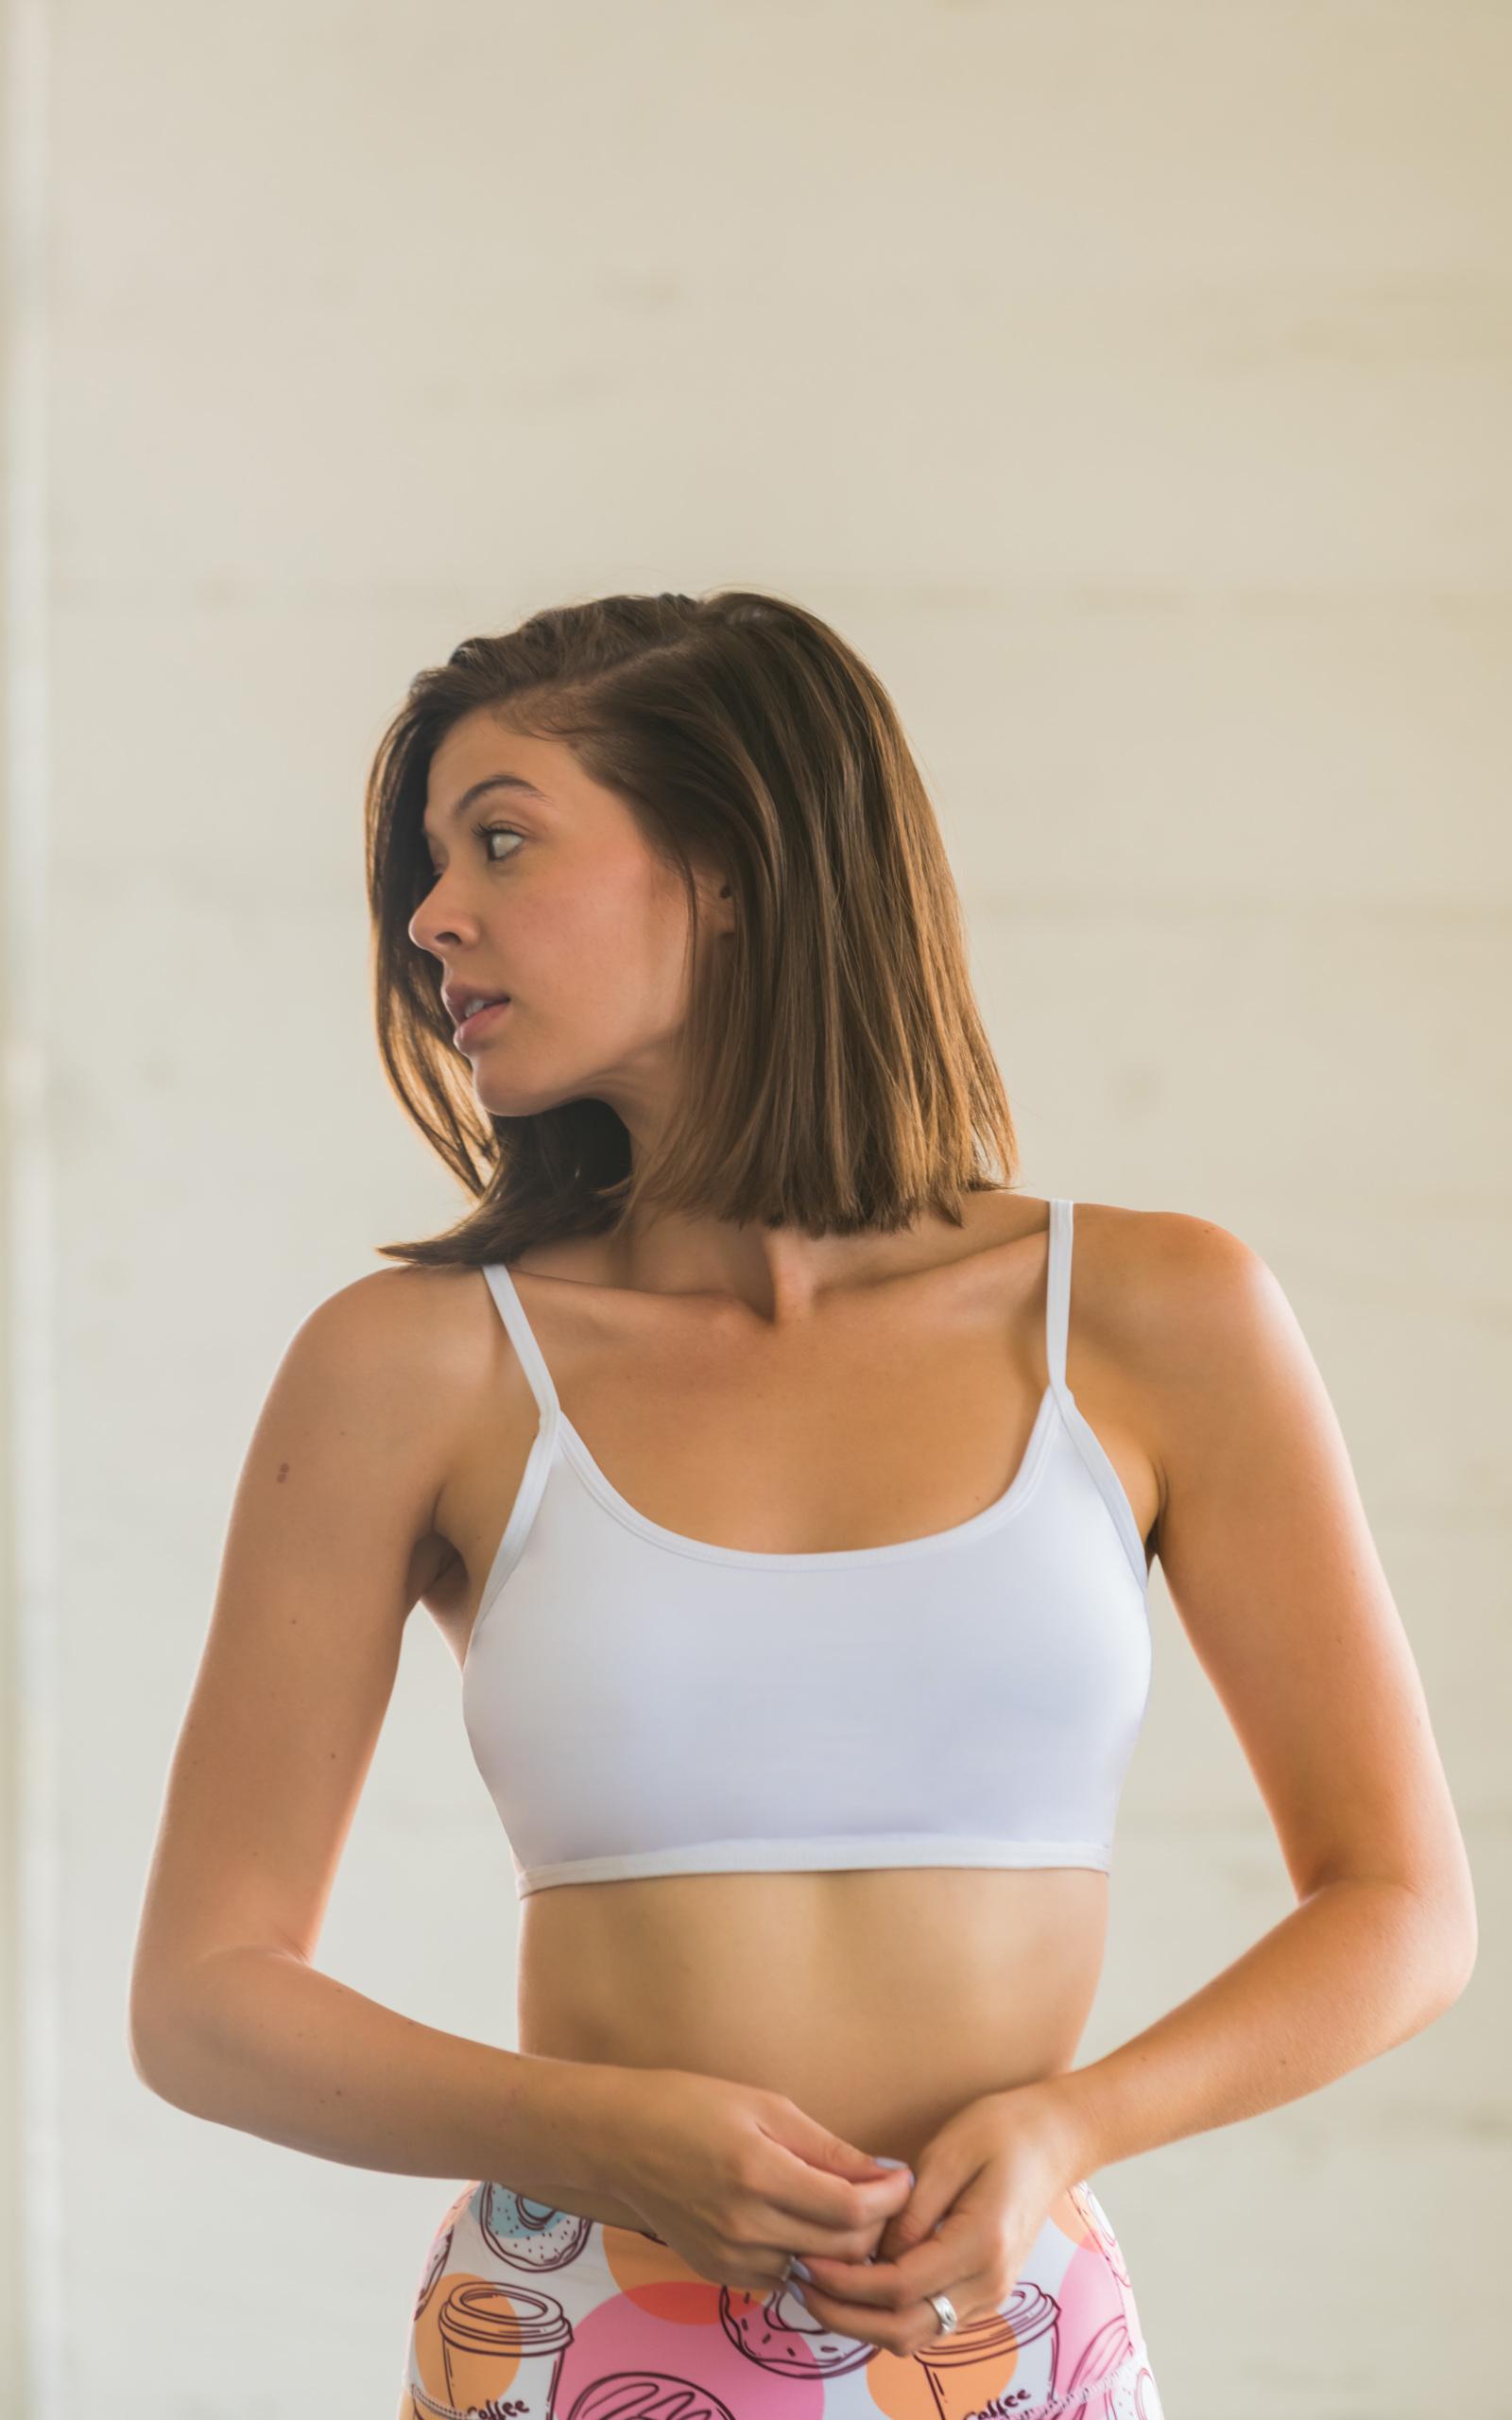 b04f33e997351 Flexi Lexi Fitness Womens White Bralette Sports Bra Lightweight Top ...